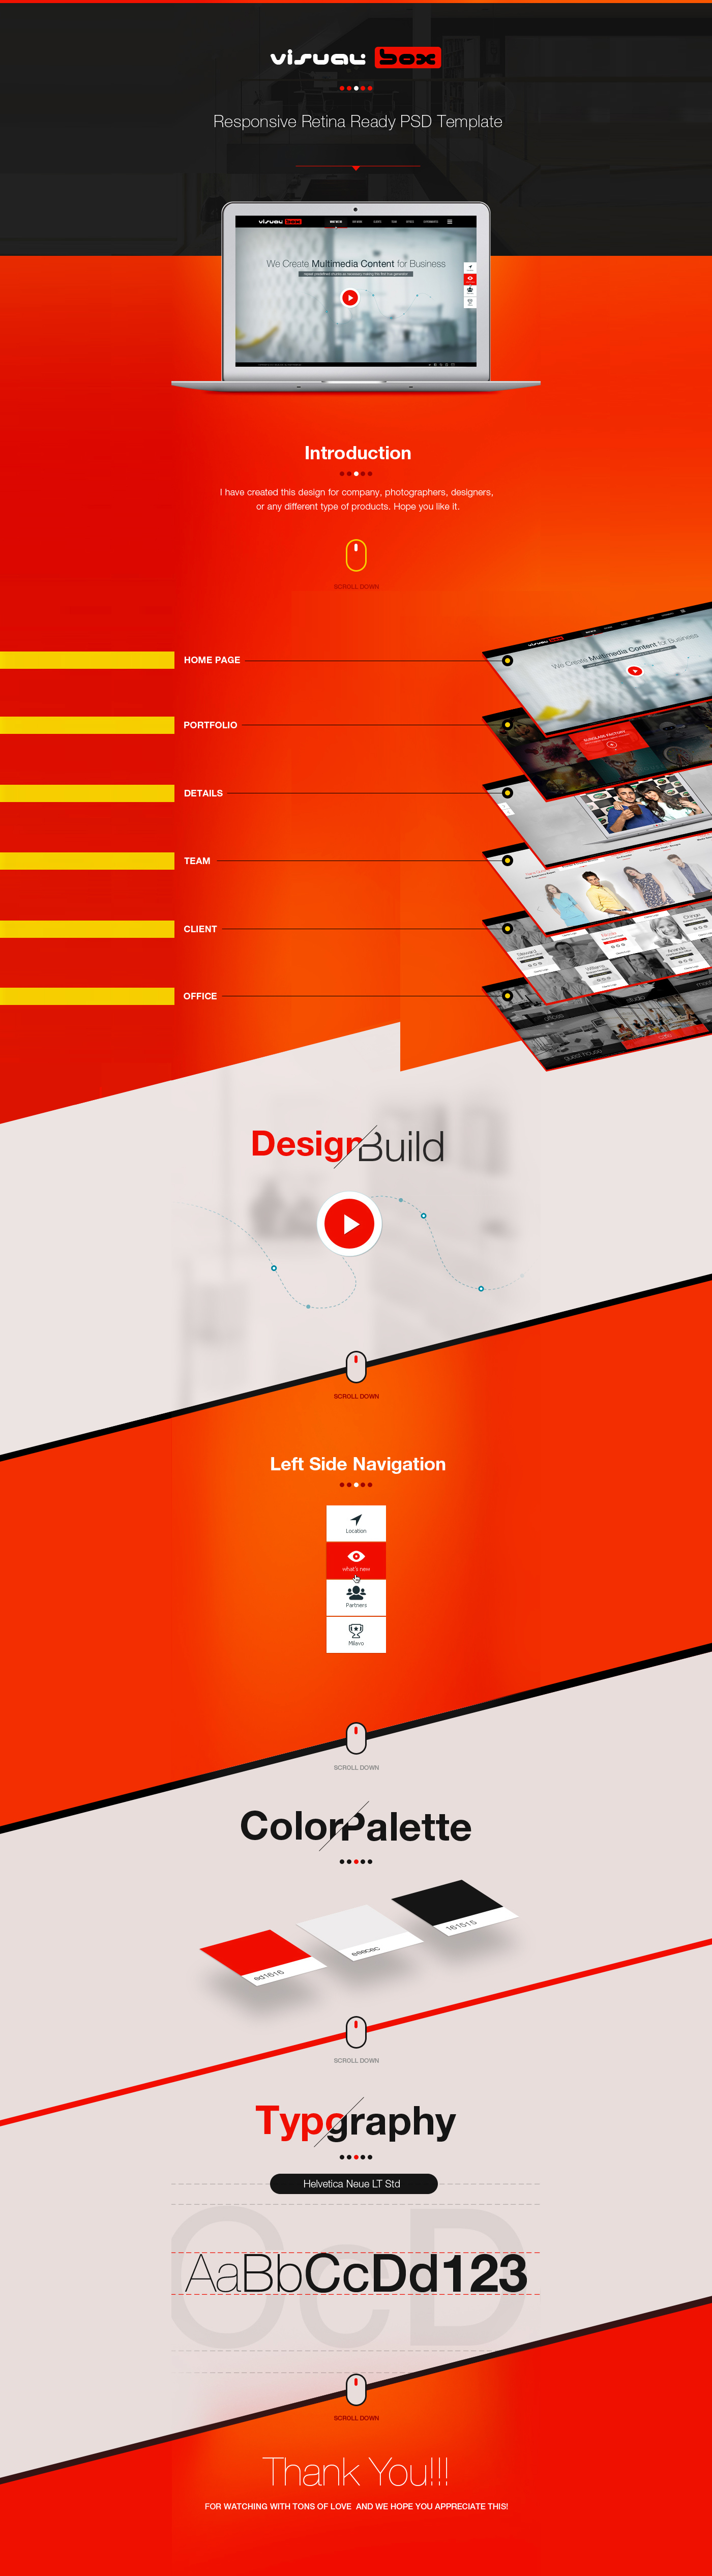 free psd template visual box on behance